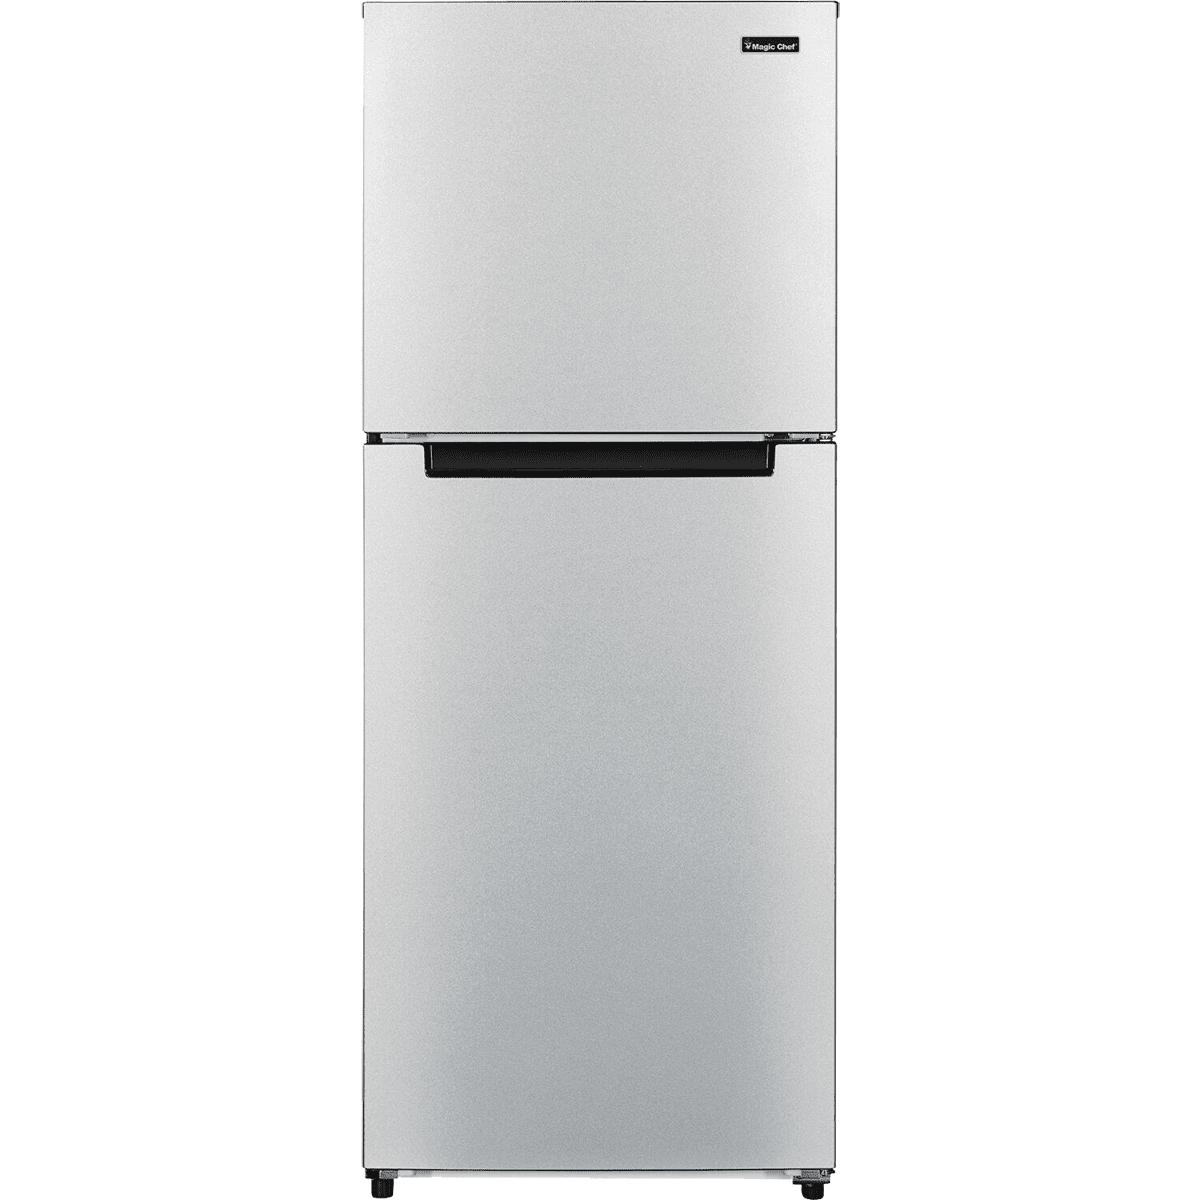 Image of Magic Chef 10.1 Cu. Ft. Energy Star Refrigerator - Platinum Steel